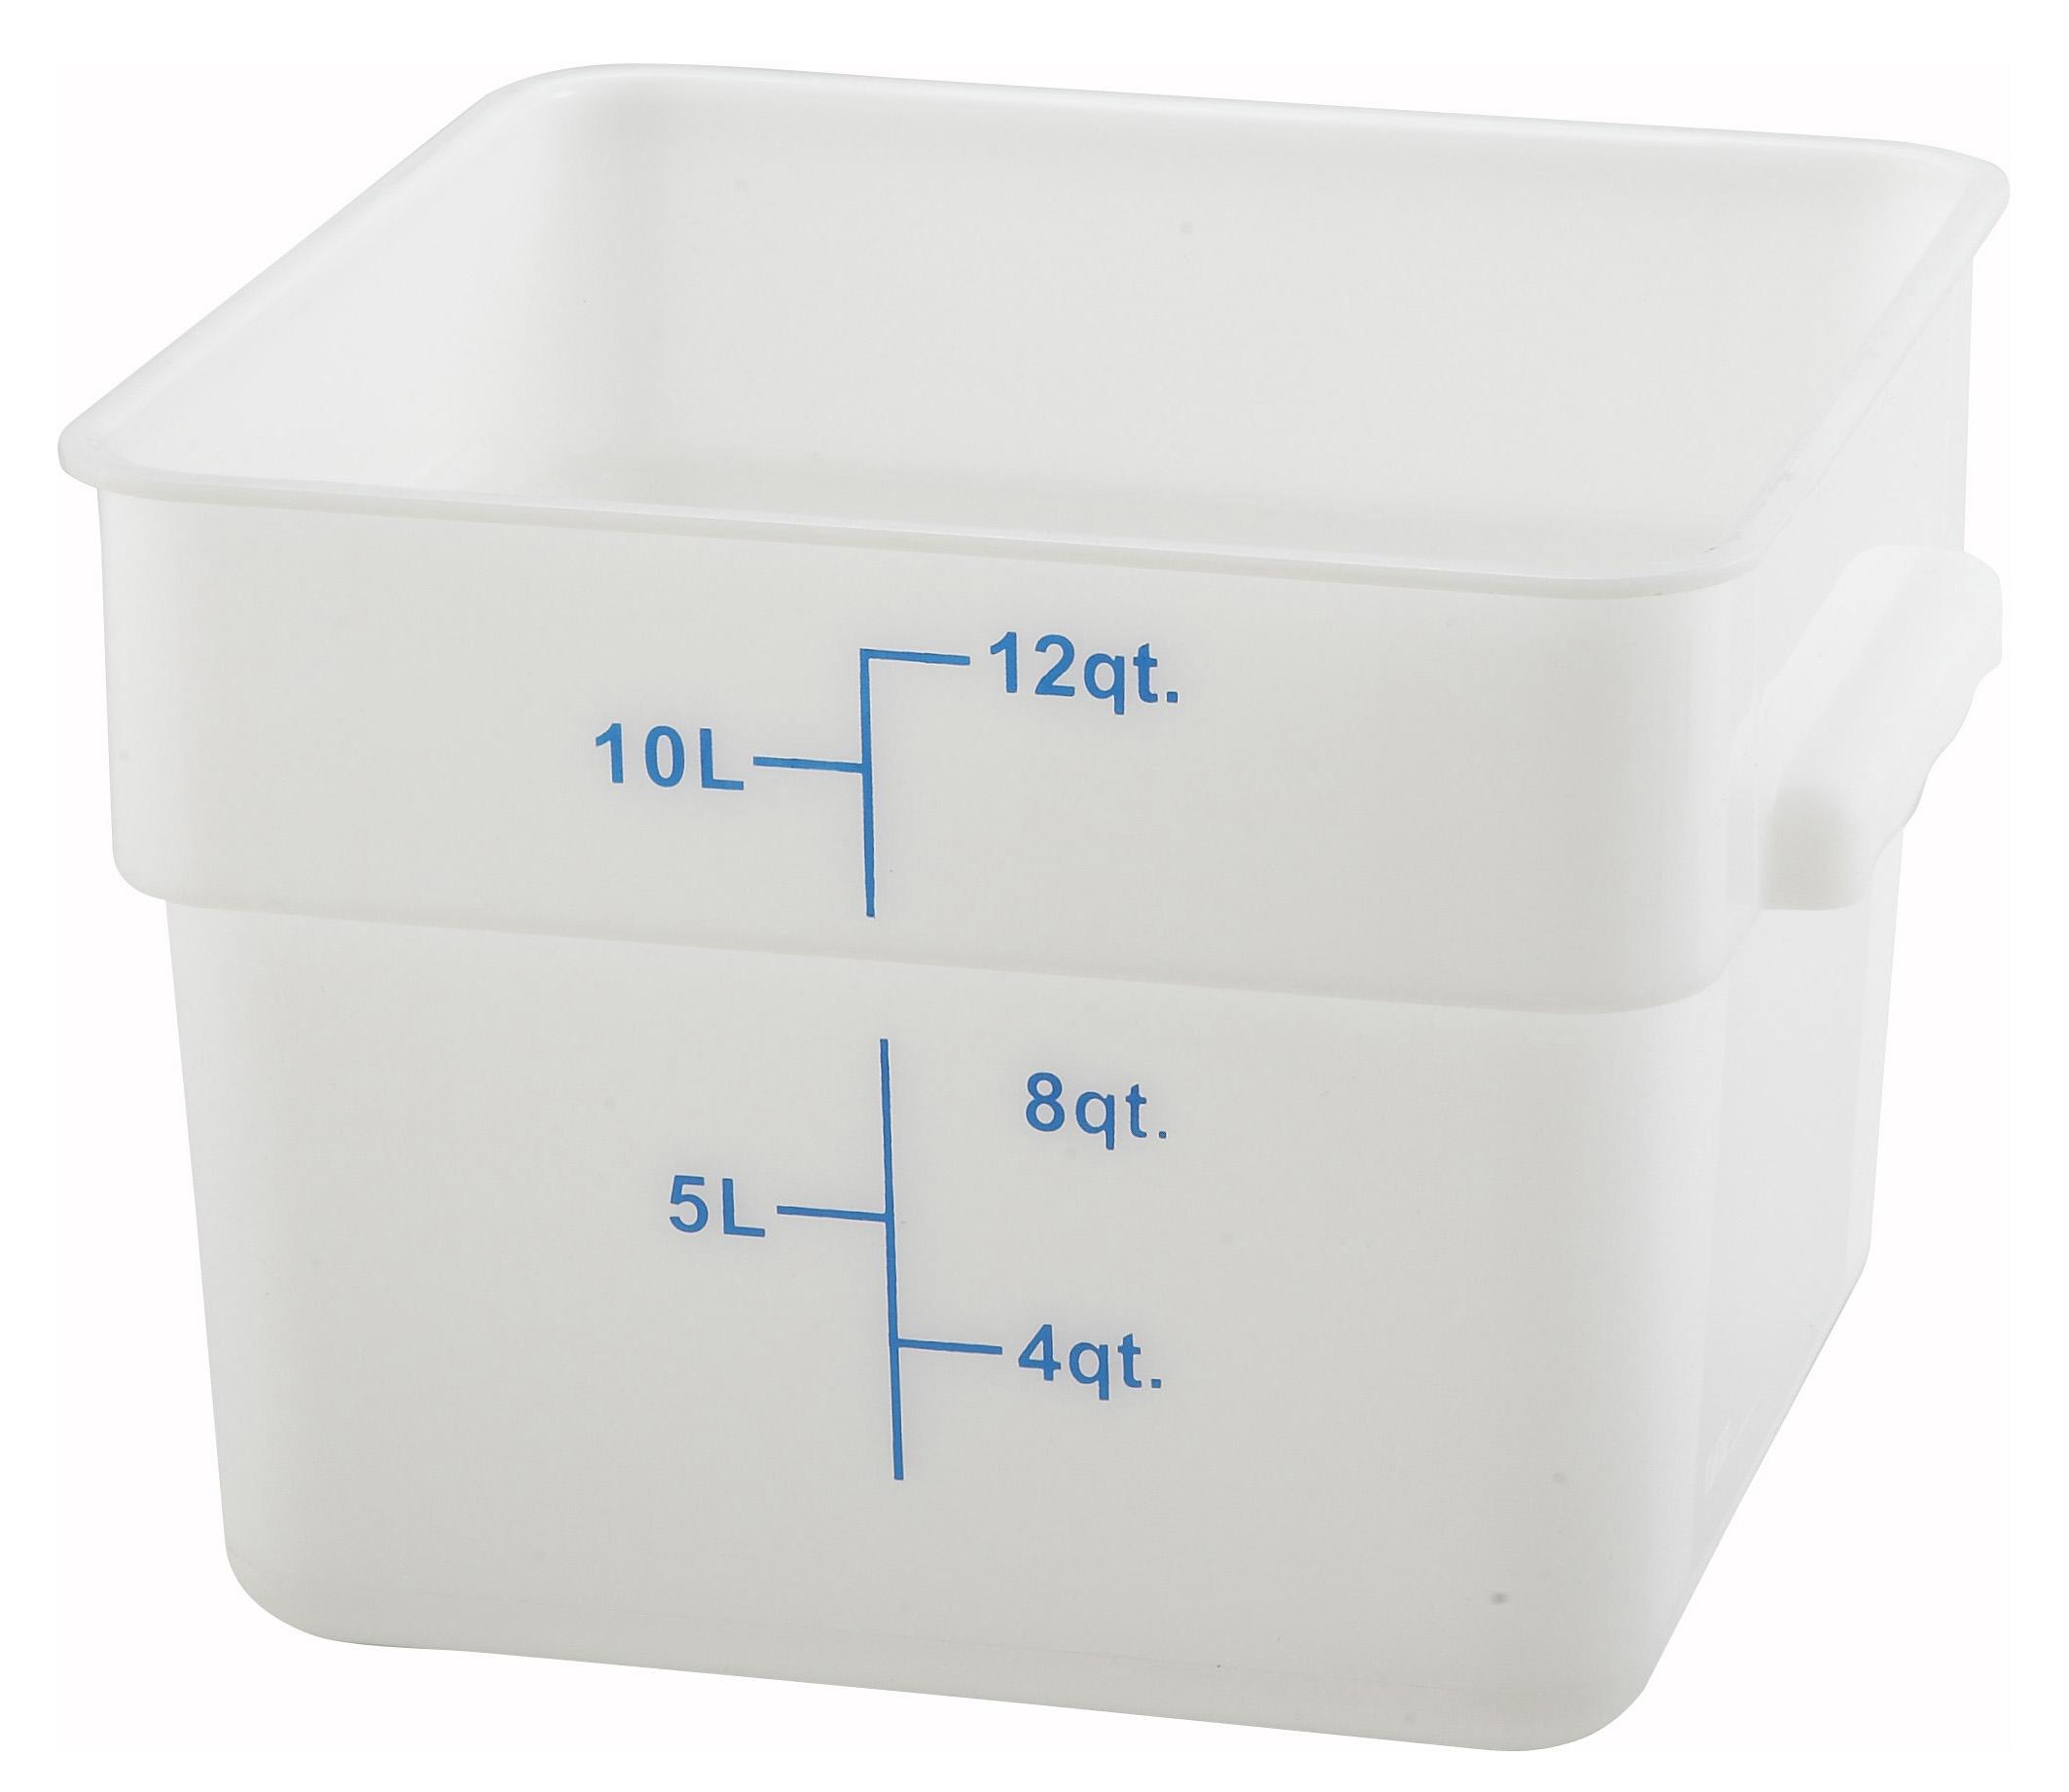 Winco PESC-12 square food storage containers